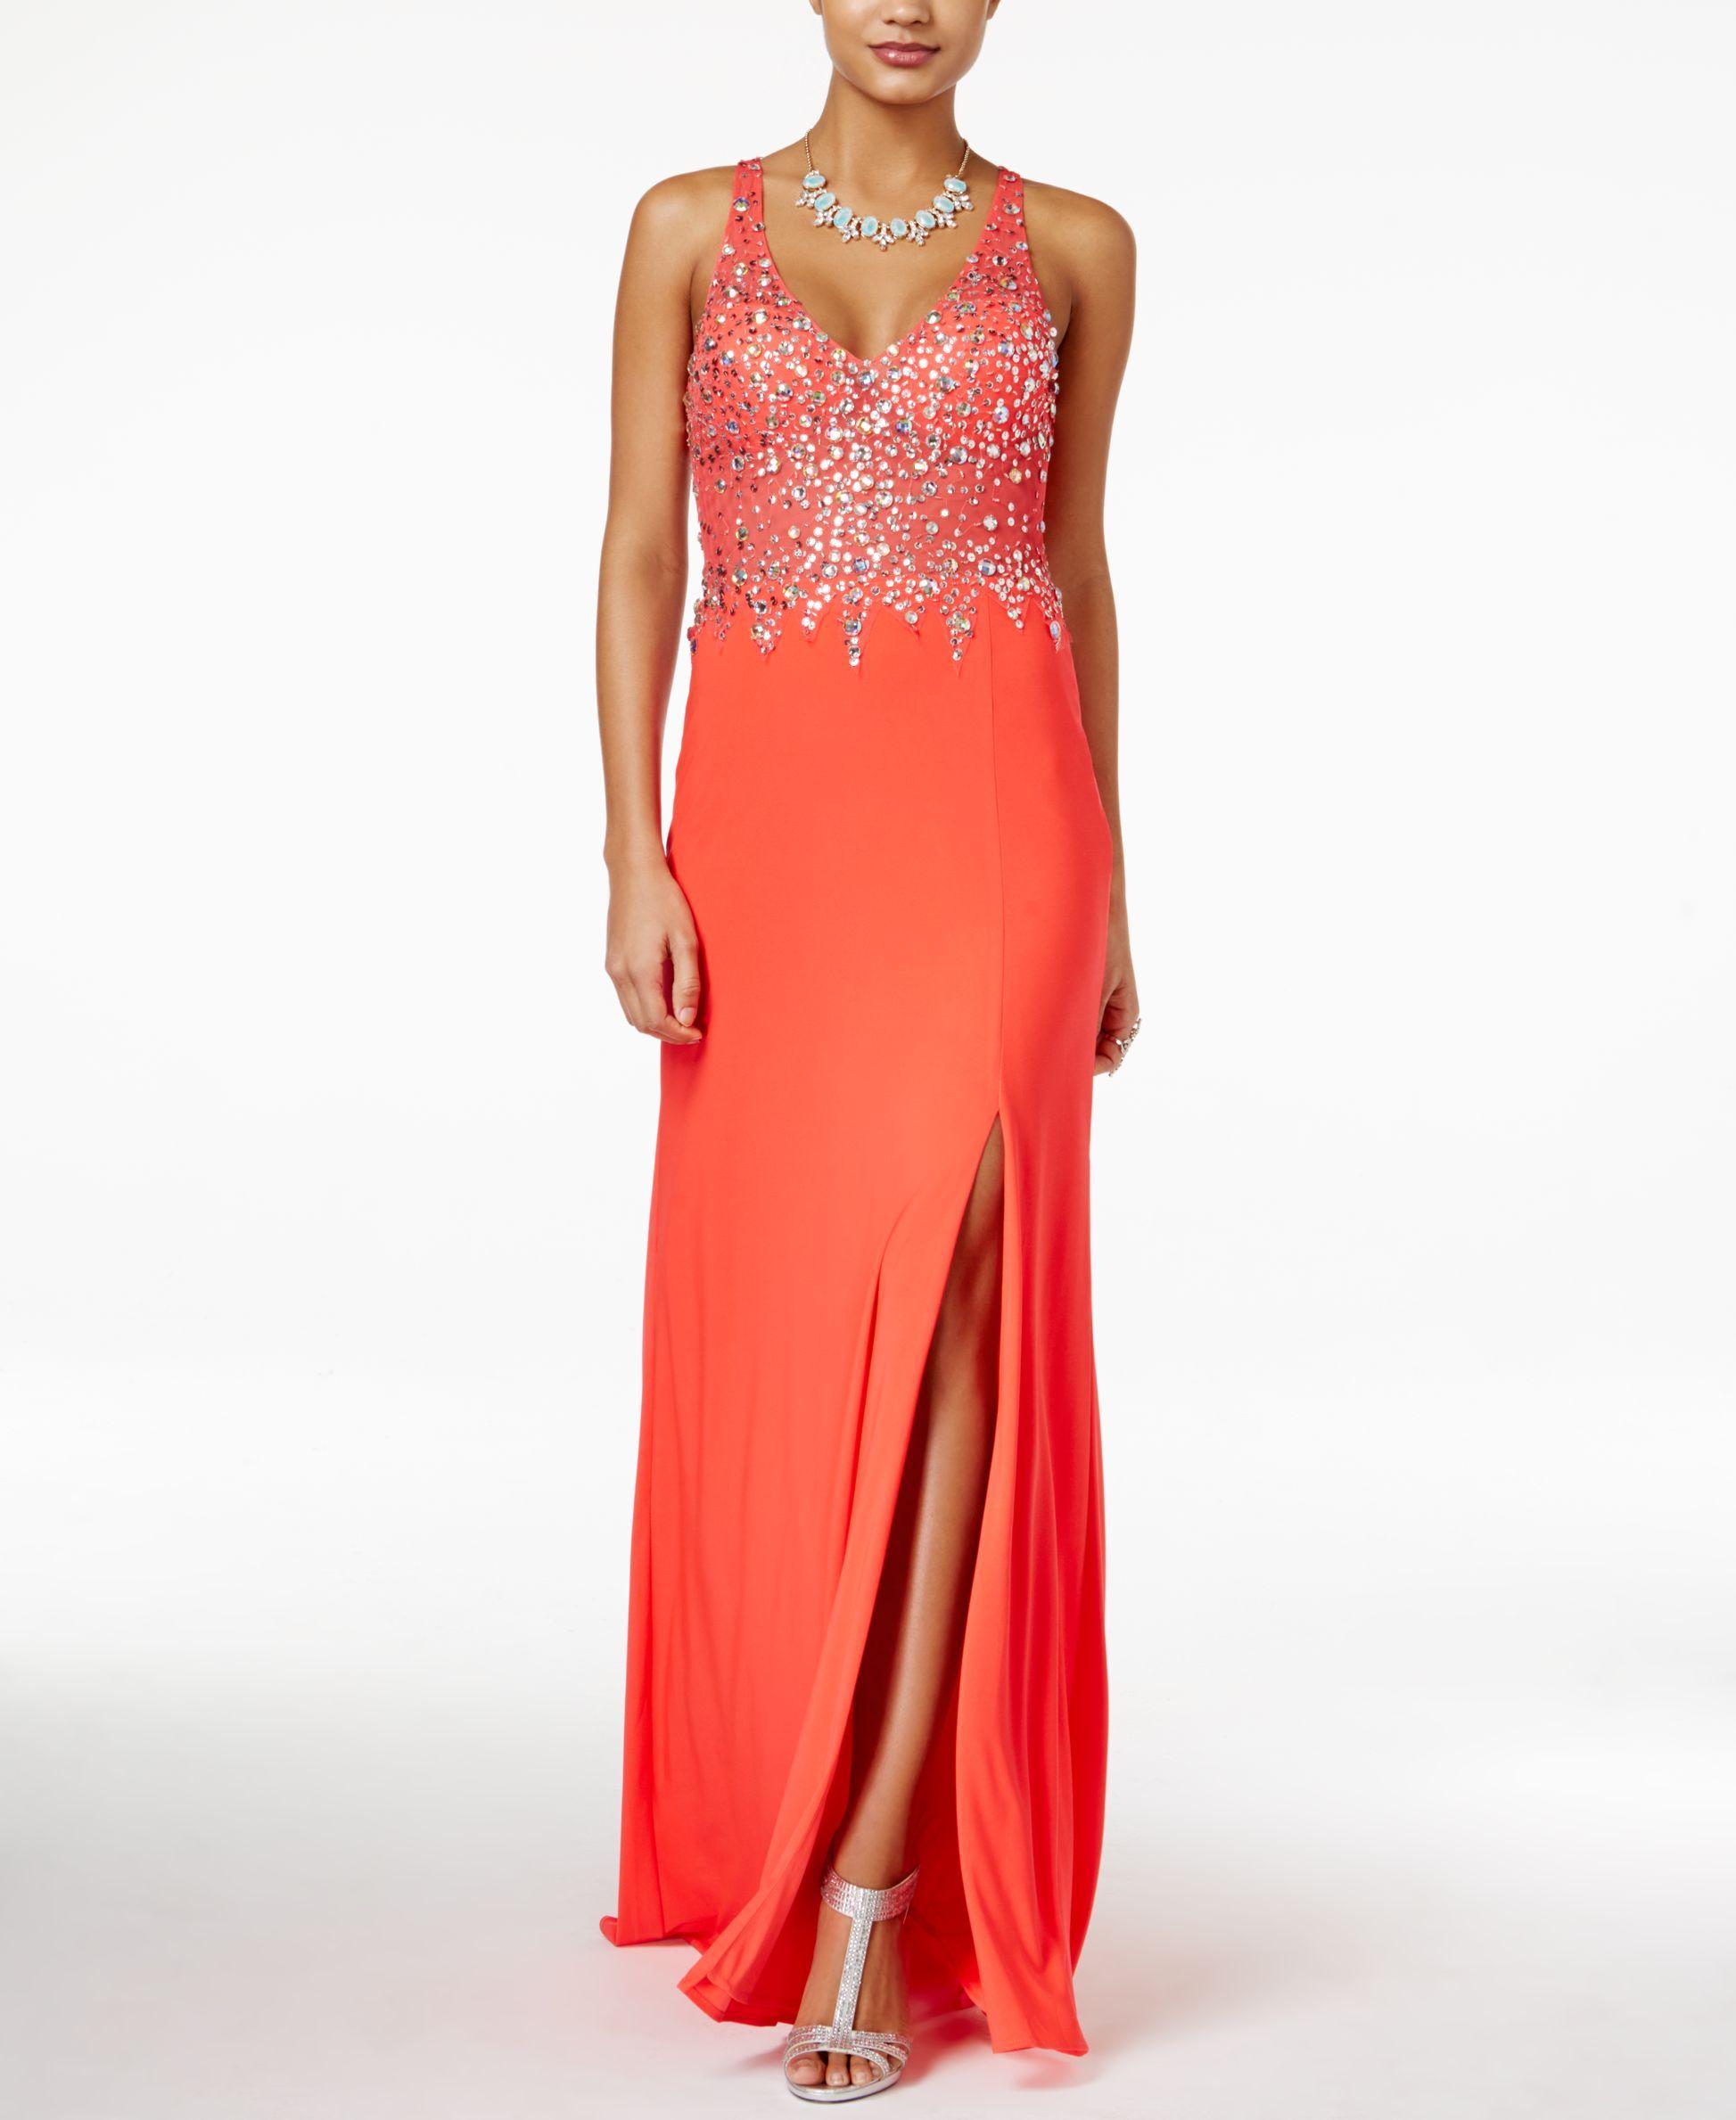 Blondie nites juniorsu embellished frontslit gown products